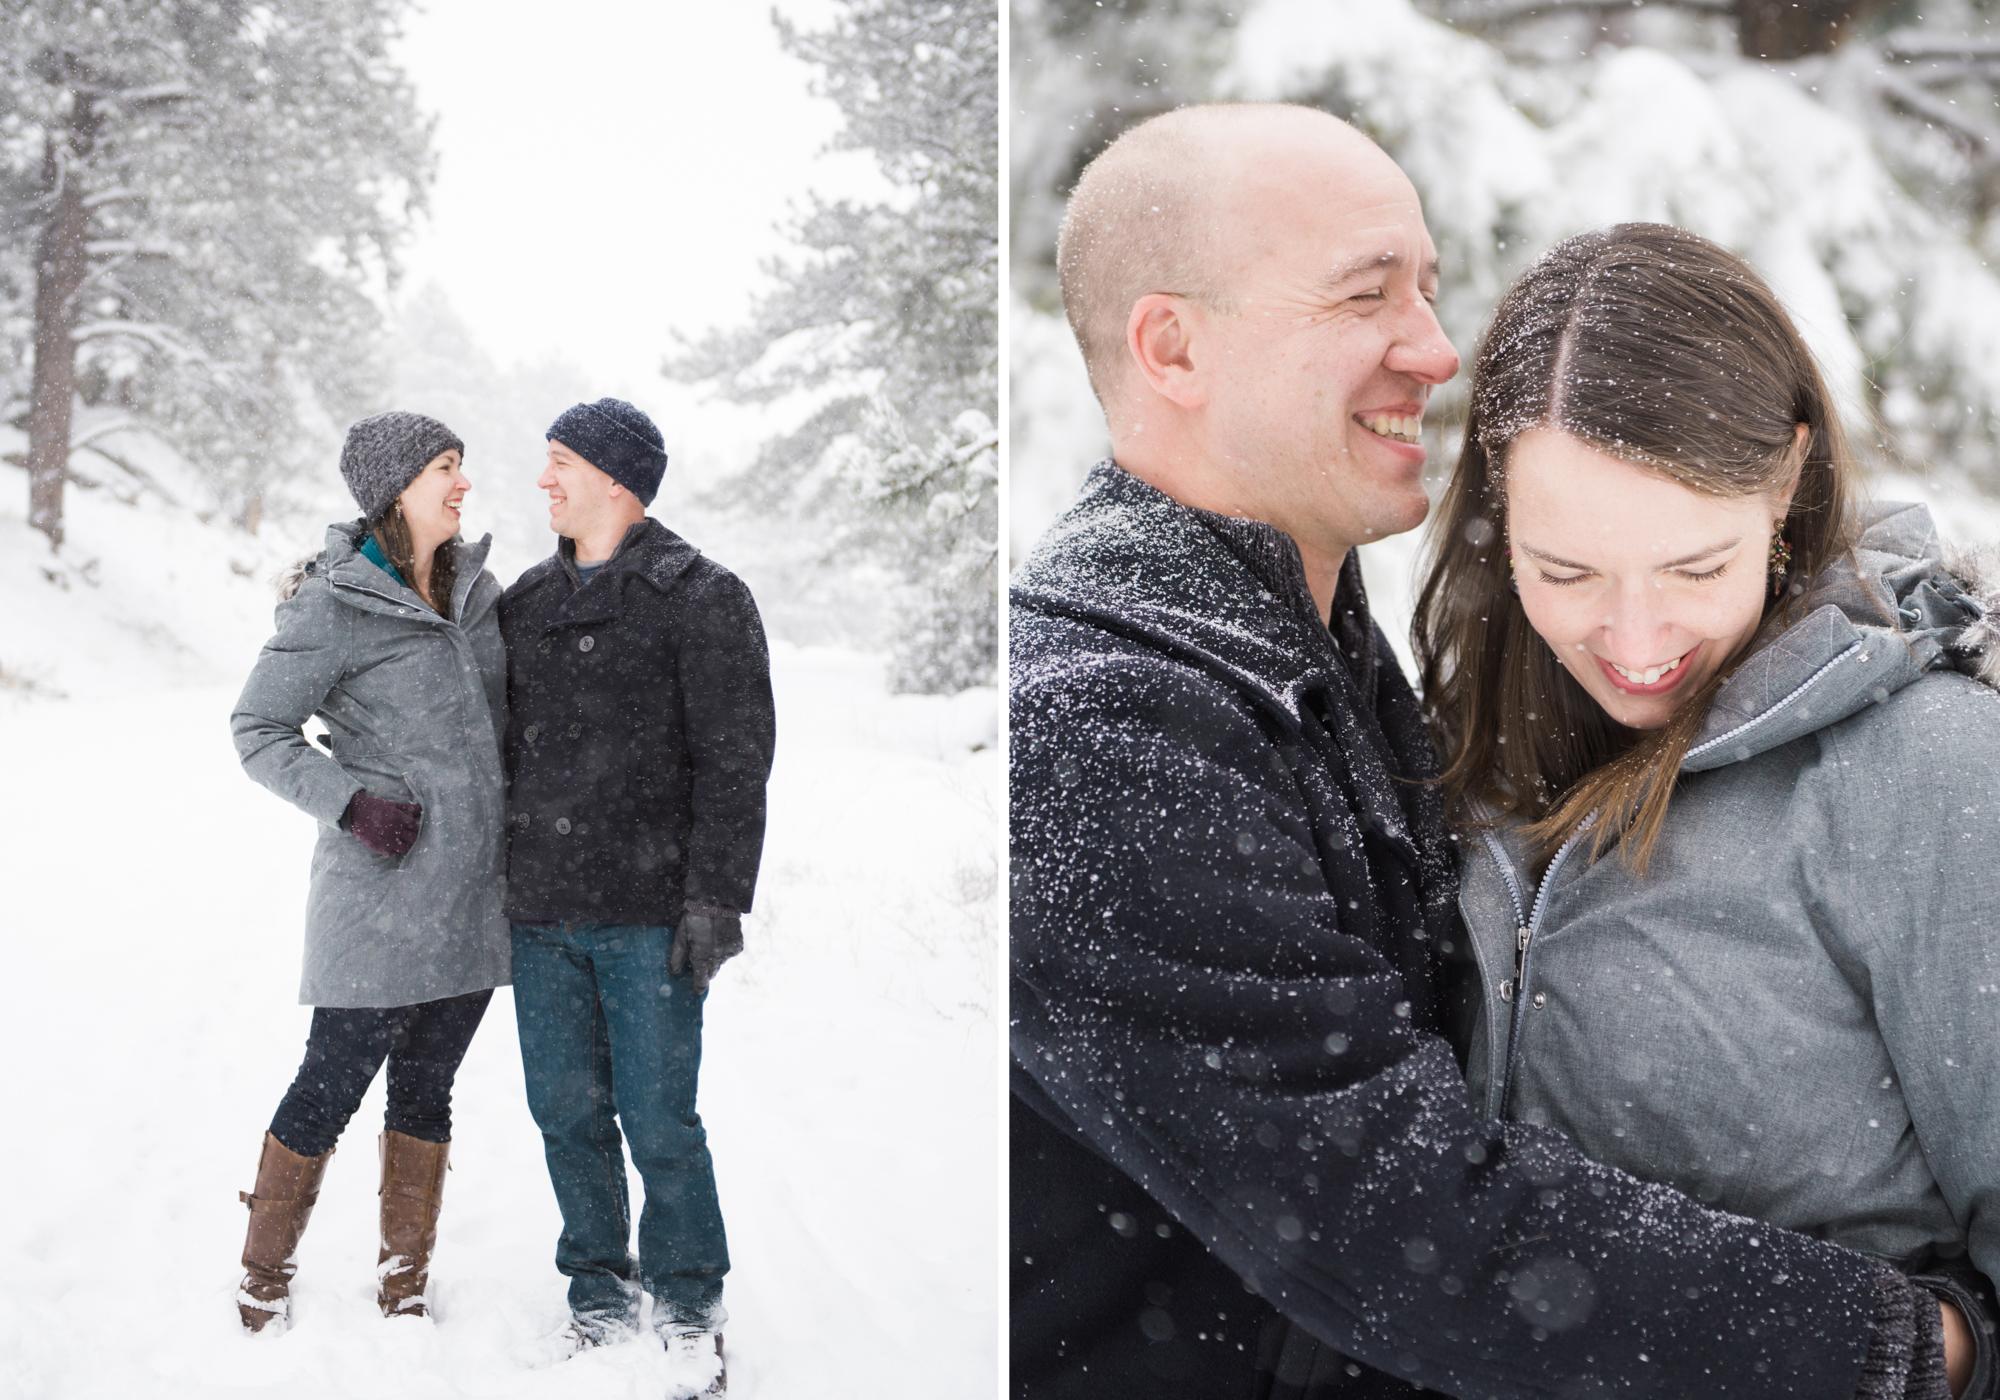 AshleighMillerPhotography-Weddings-engagment-boulder-colorado-snowengagementession-1.jpg